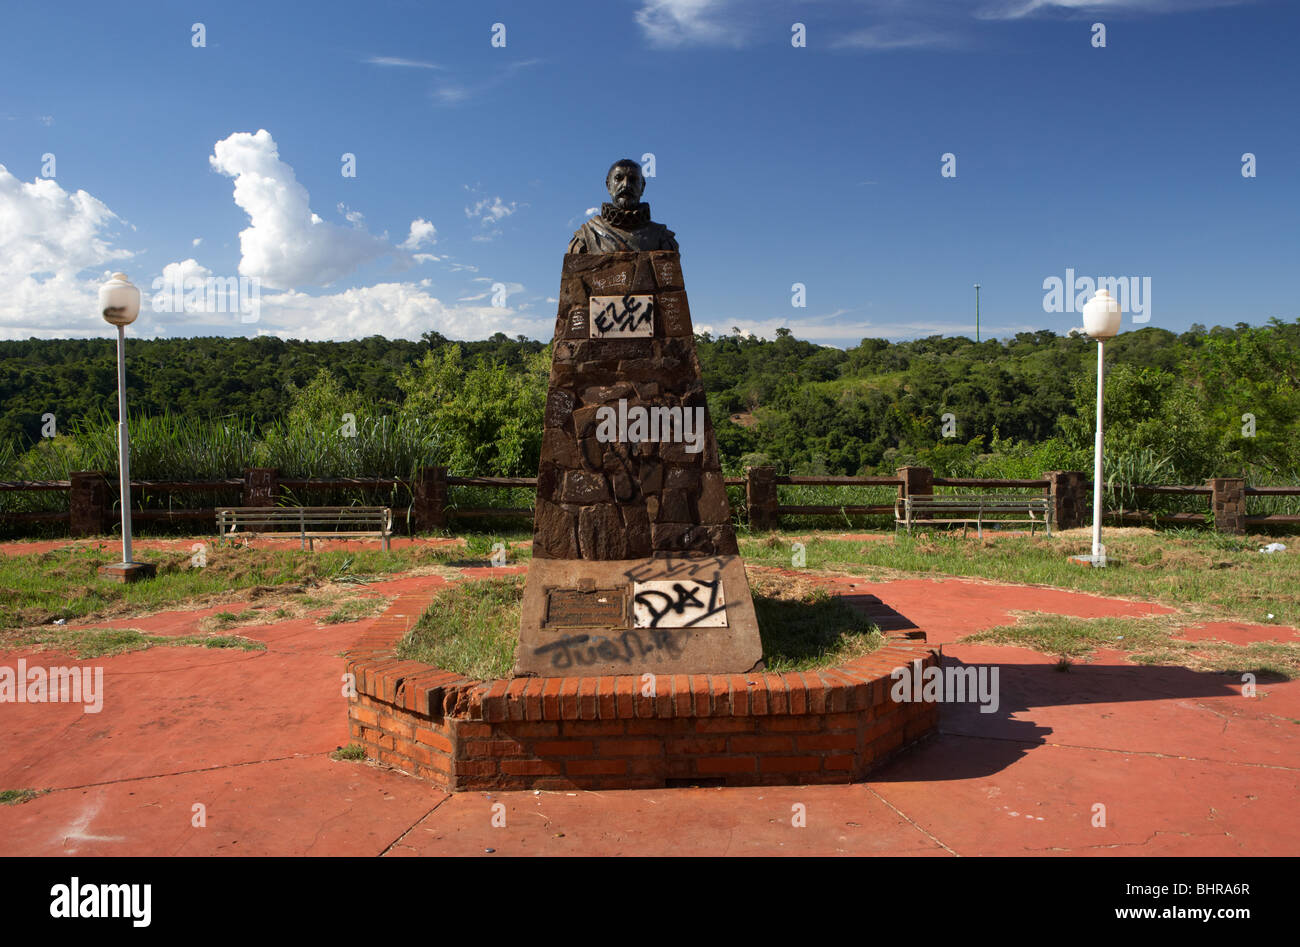 statue and bust of spanish explorer alvar nunez cabeza de vaca defaced with grafitti in puerto iguazu argentina - Stock Image